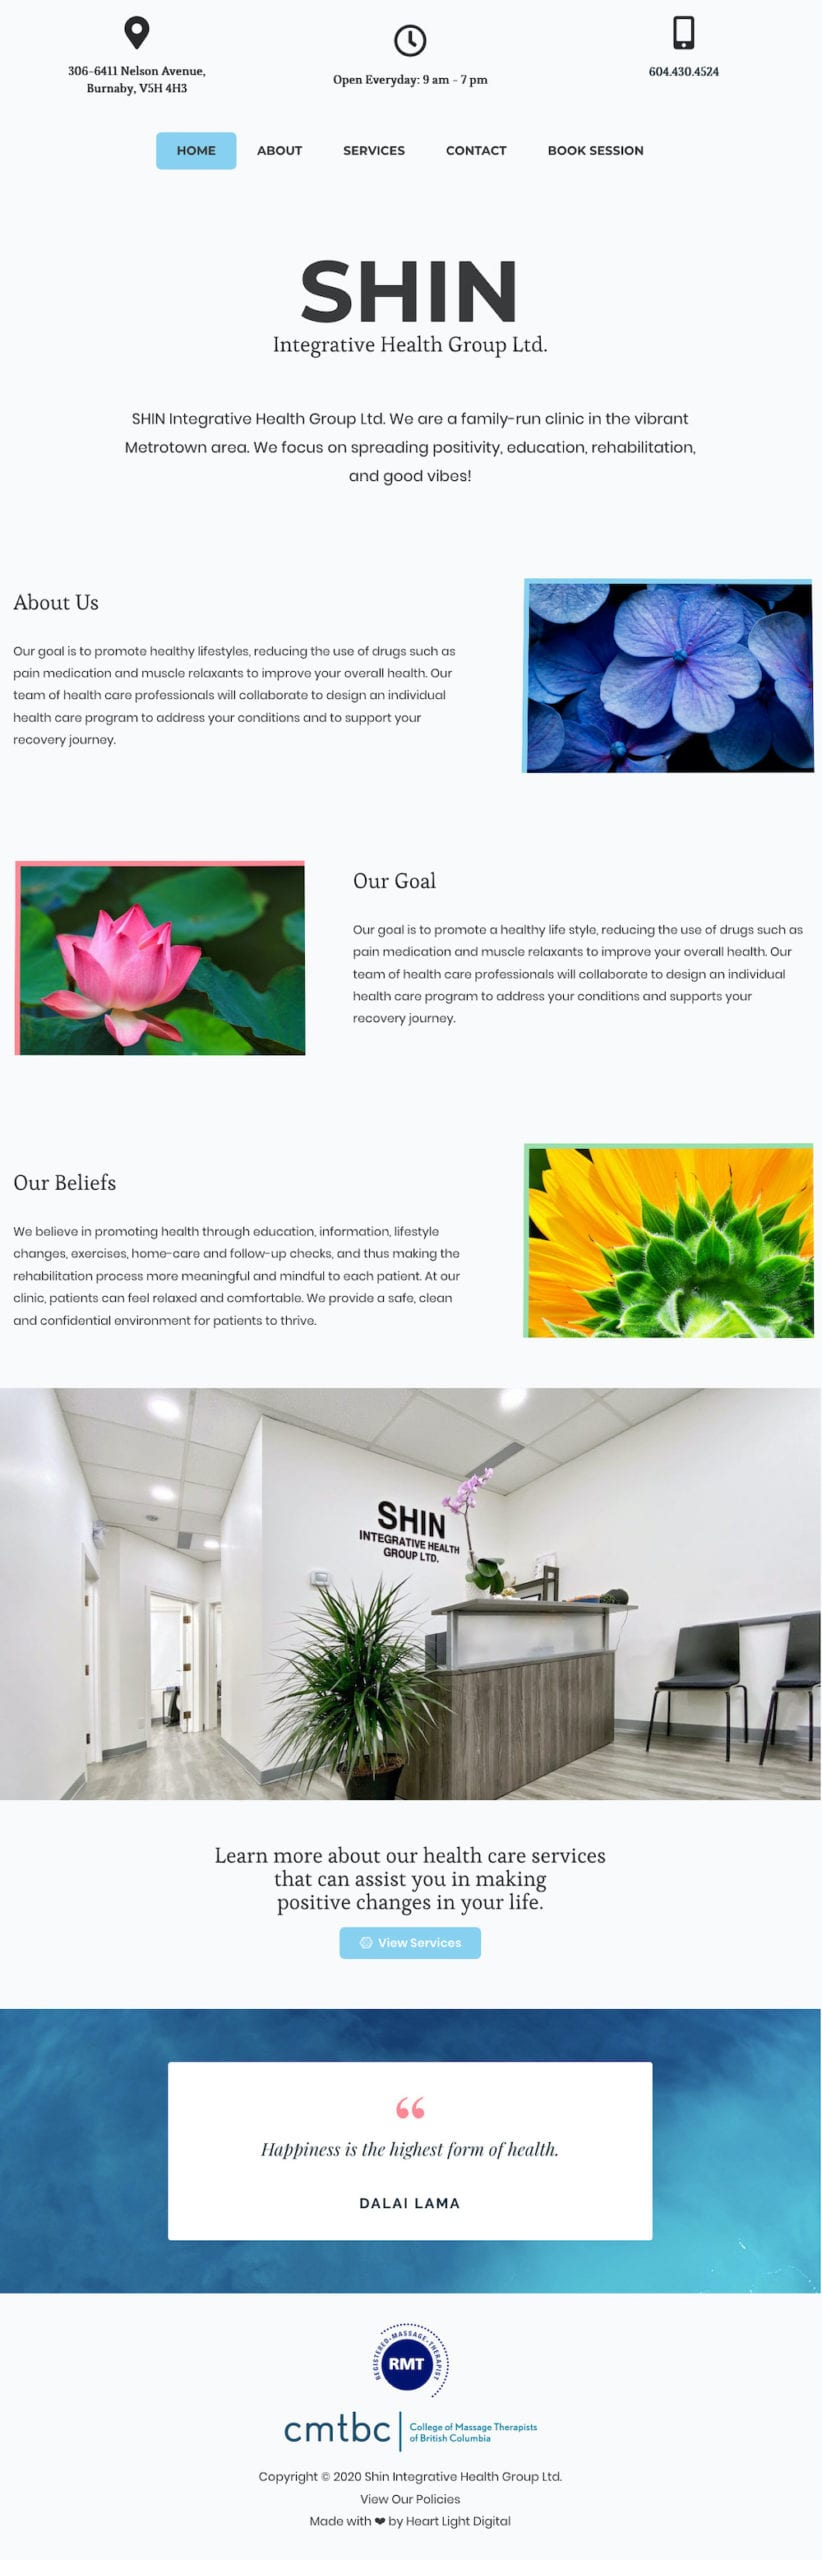 Shin Integrative Health Group Website